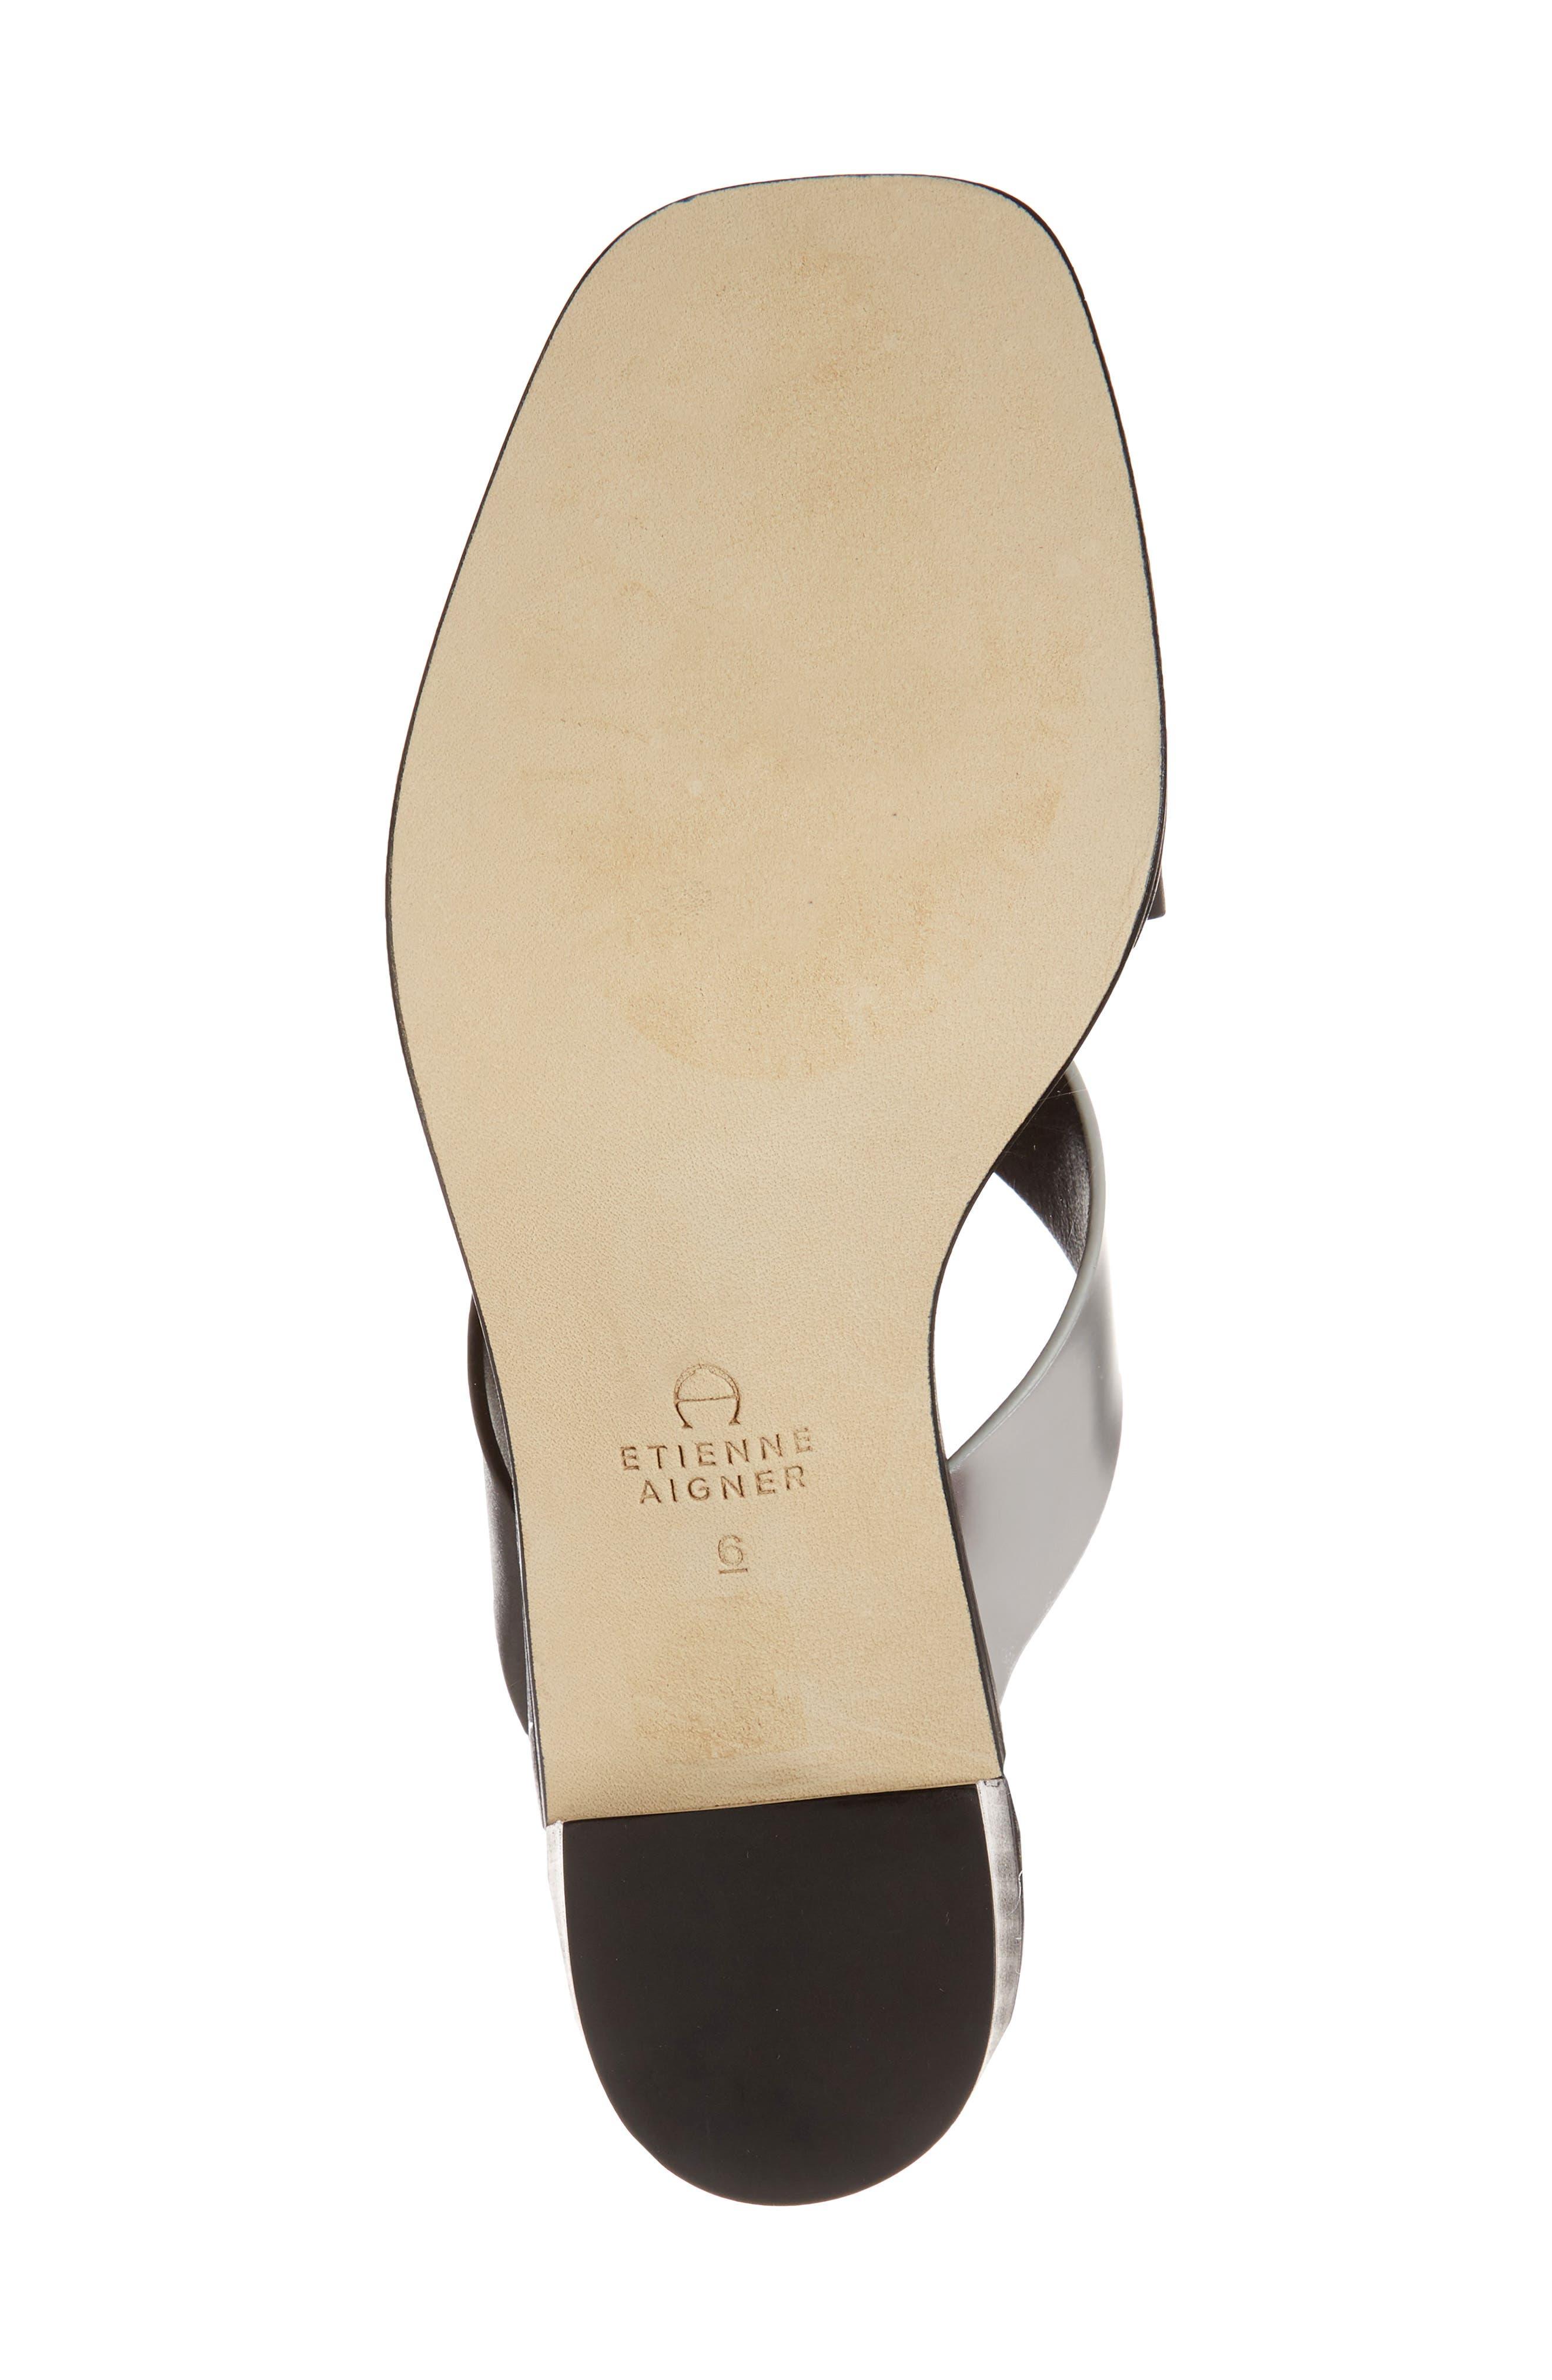 Negroni Cross Strap Mule Sandal,                             Alternate thumbnail 6, color,                             BLACK/ SILVER LEATHER